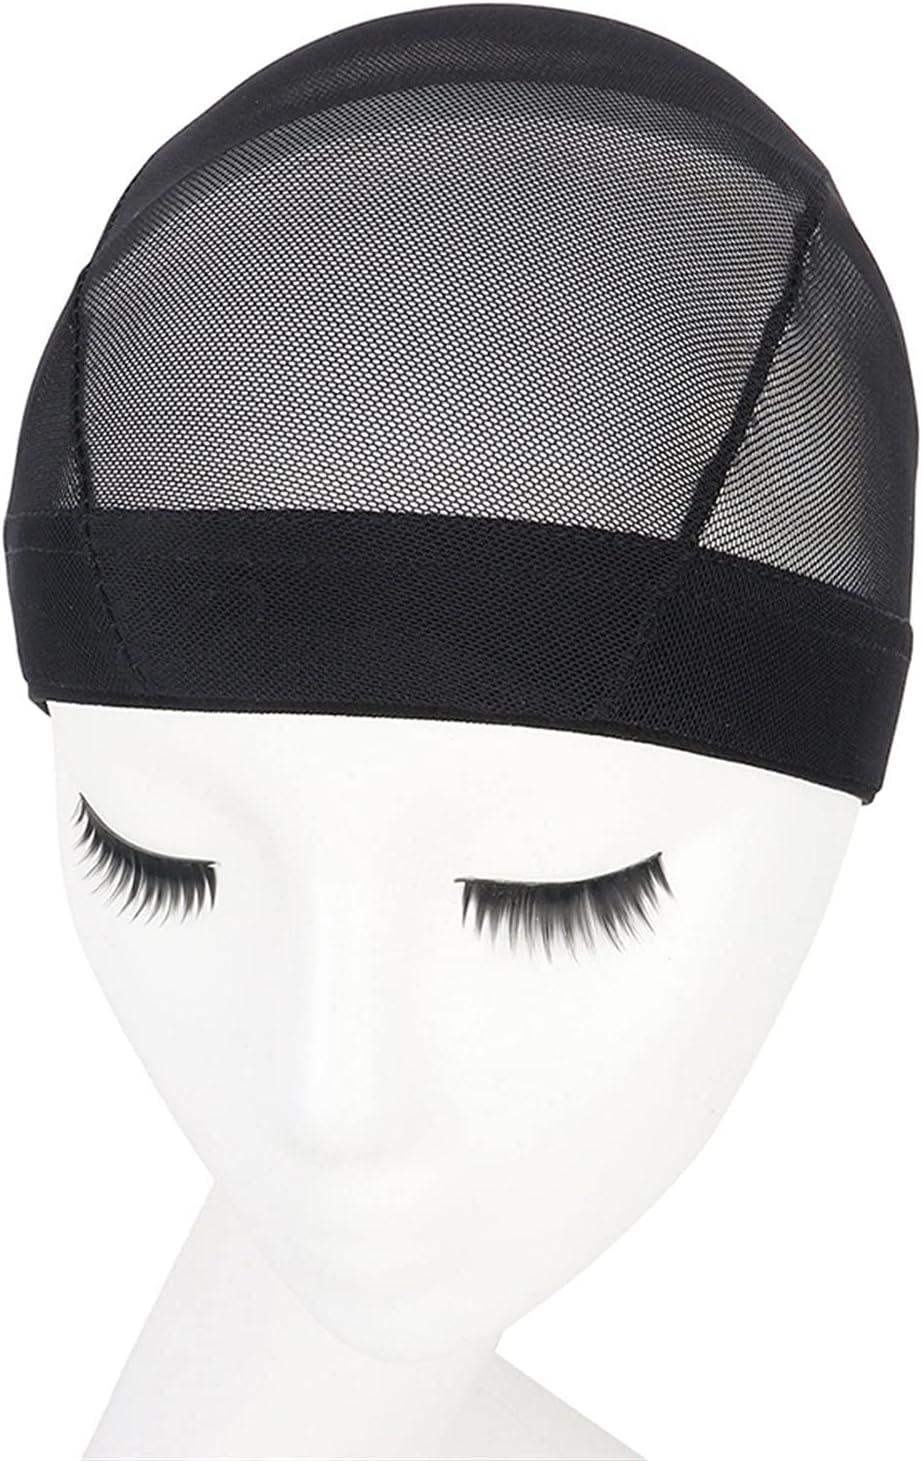 1-10 Dome Type Mesh Wig Caps for Wigs Elastic Cap Ranking Max 59% OFF TOP7 Knit Black Ela